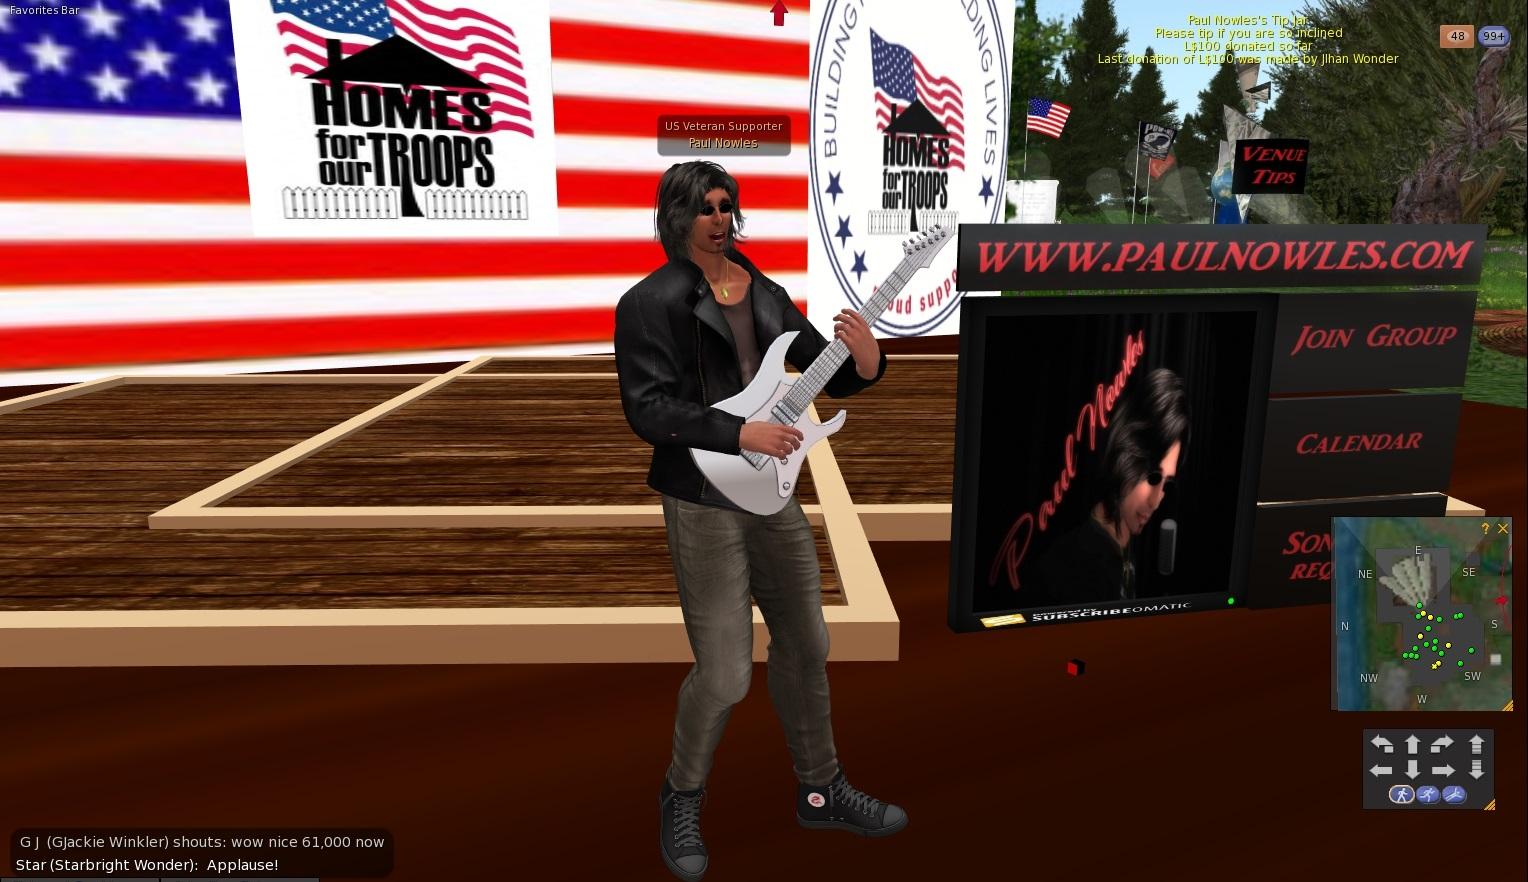 Second Life Newser: Veterans Isle Concert Raises Over